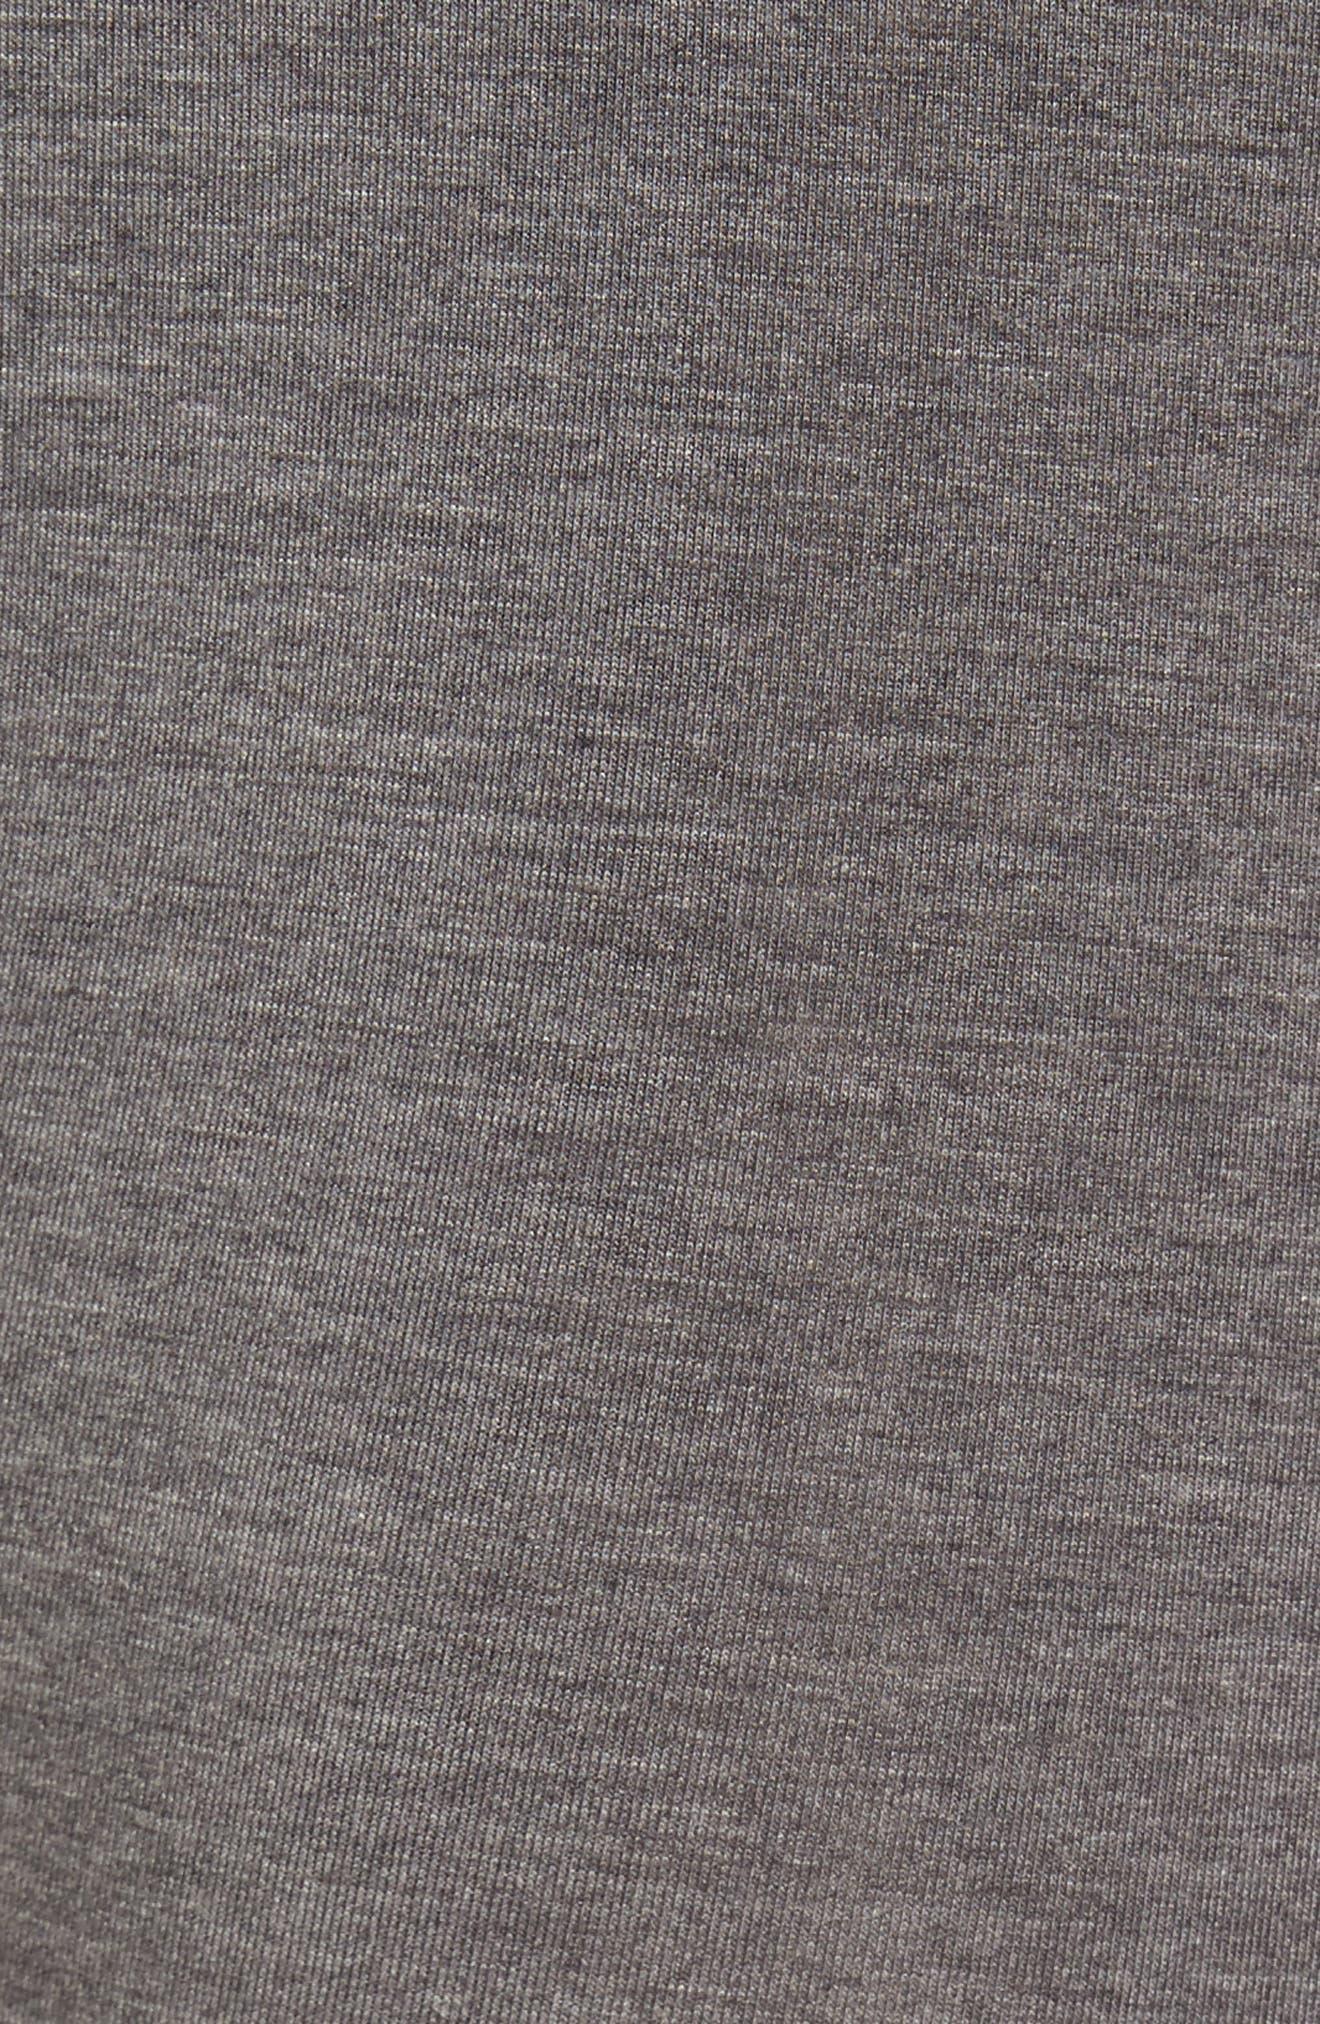 Thermal Long Johns,                             Alternate thumbnail 5, color,